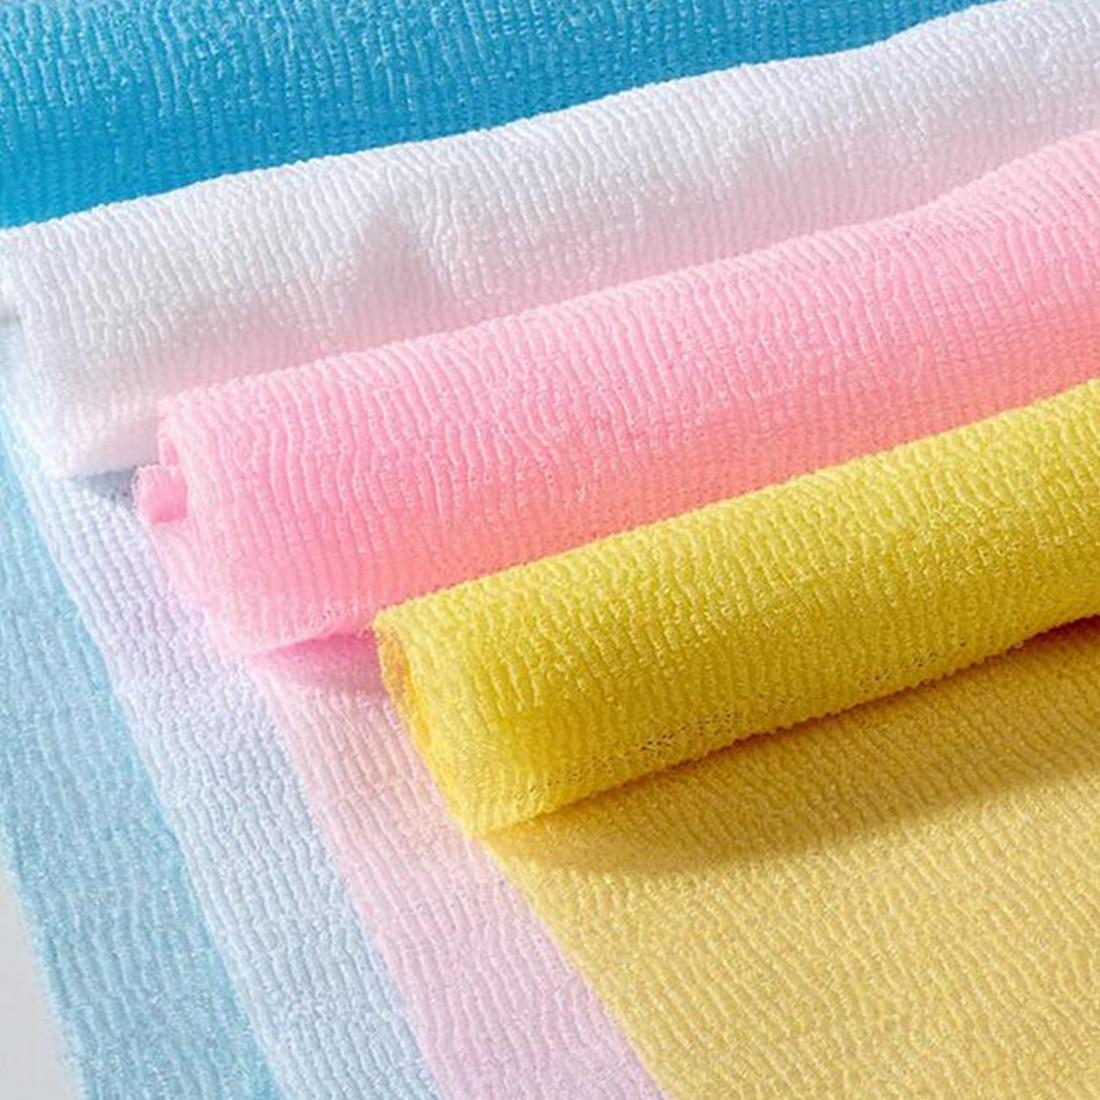 Best Nylon Scrubbing Cloth Towel Bath Shower Body Cleaning Washing Sponges Scrubbers Bathroom Tool